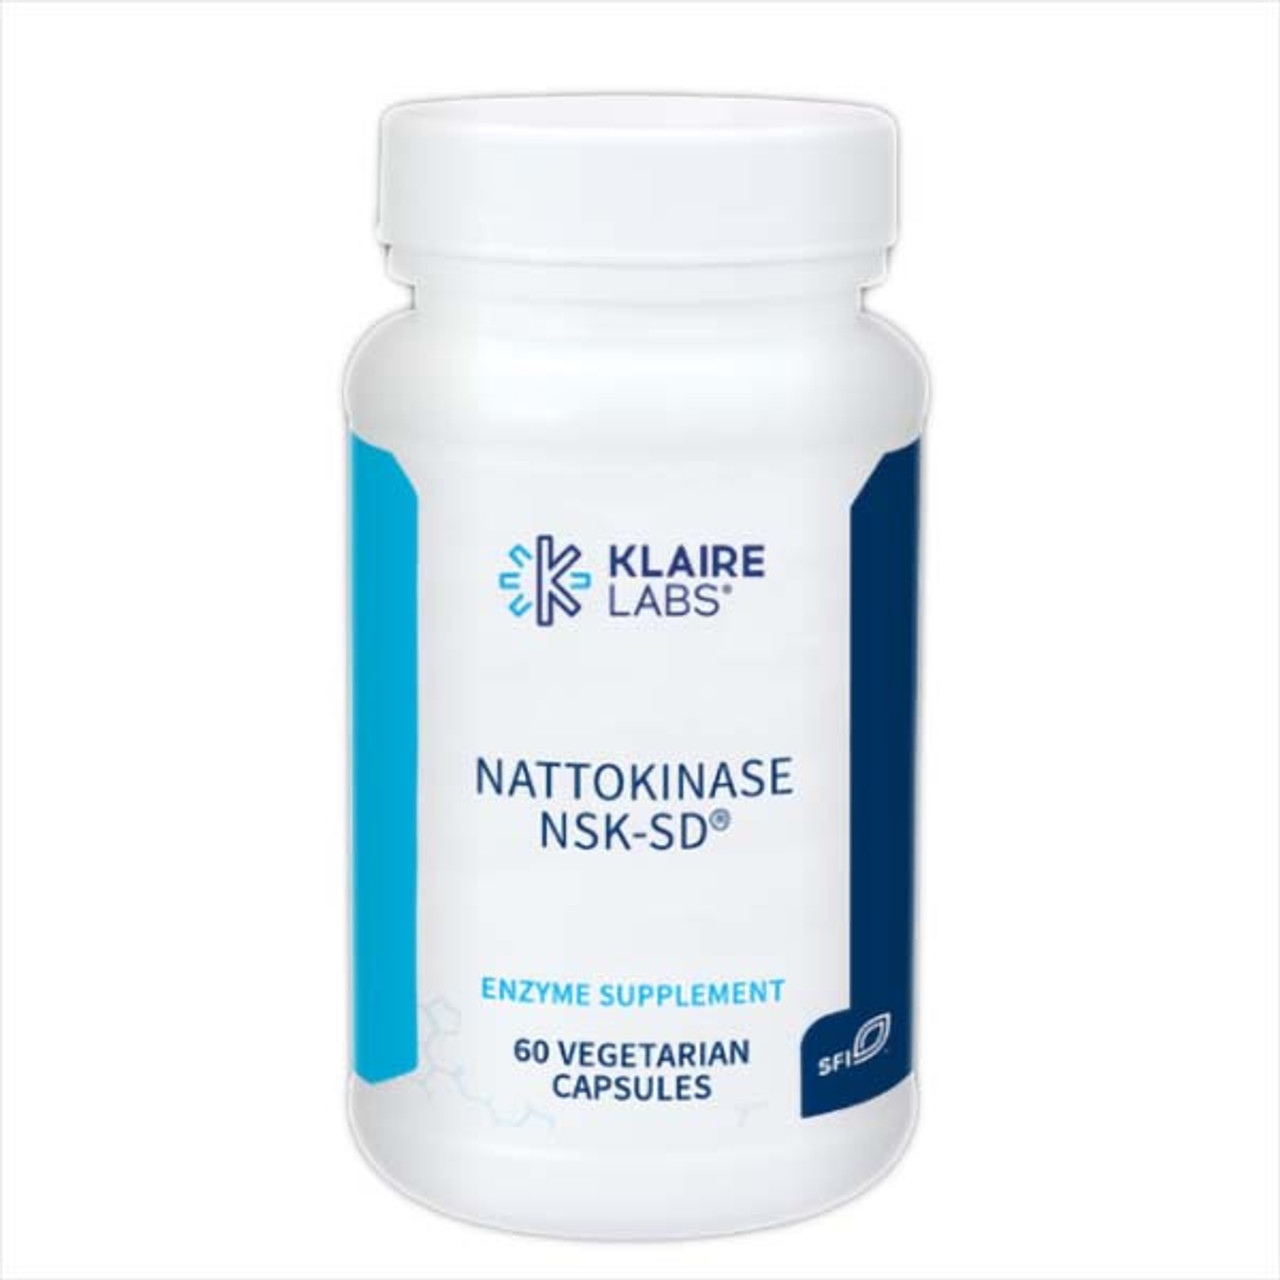 Nattokinase NSK-SD 60 Caps (100 mg)